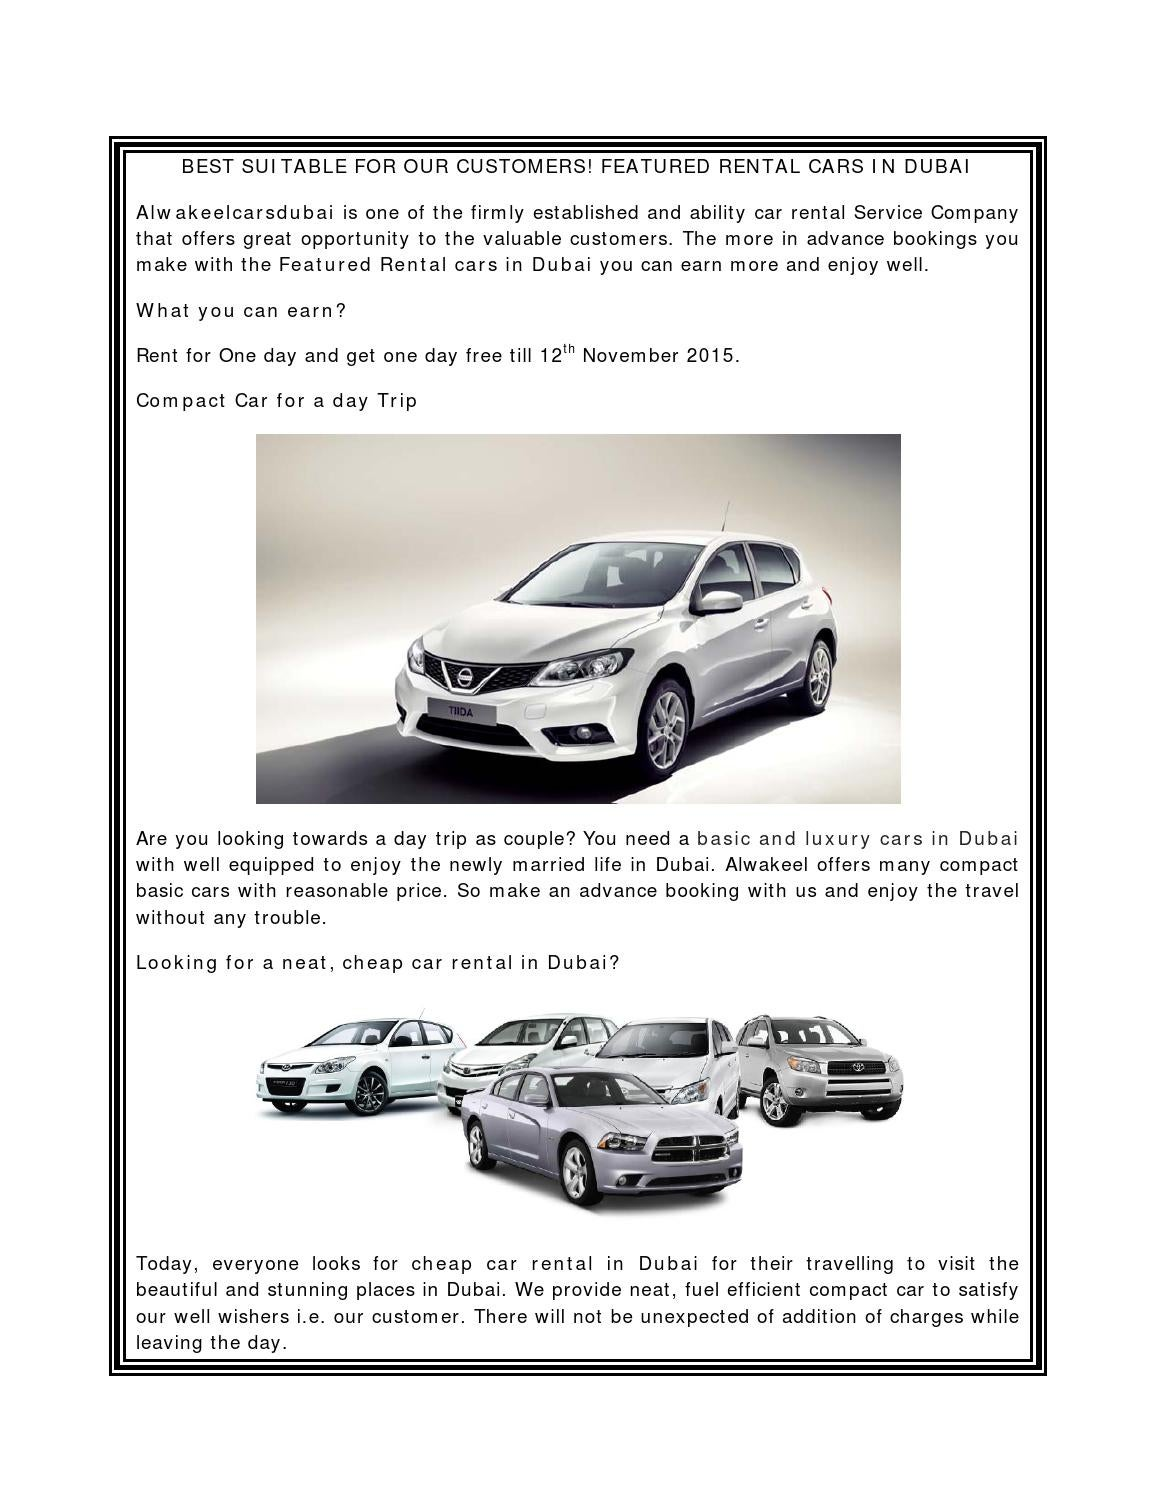 With The Excitement Travel Cheap Car Rental In Dubai By Alwakeelcarsdubai Issuu